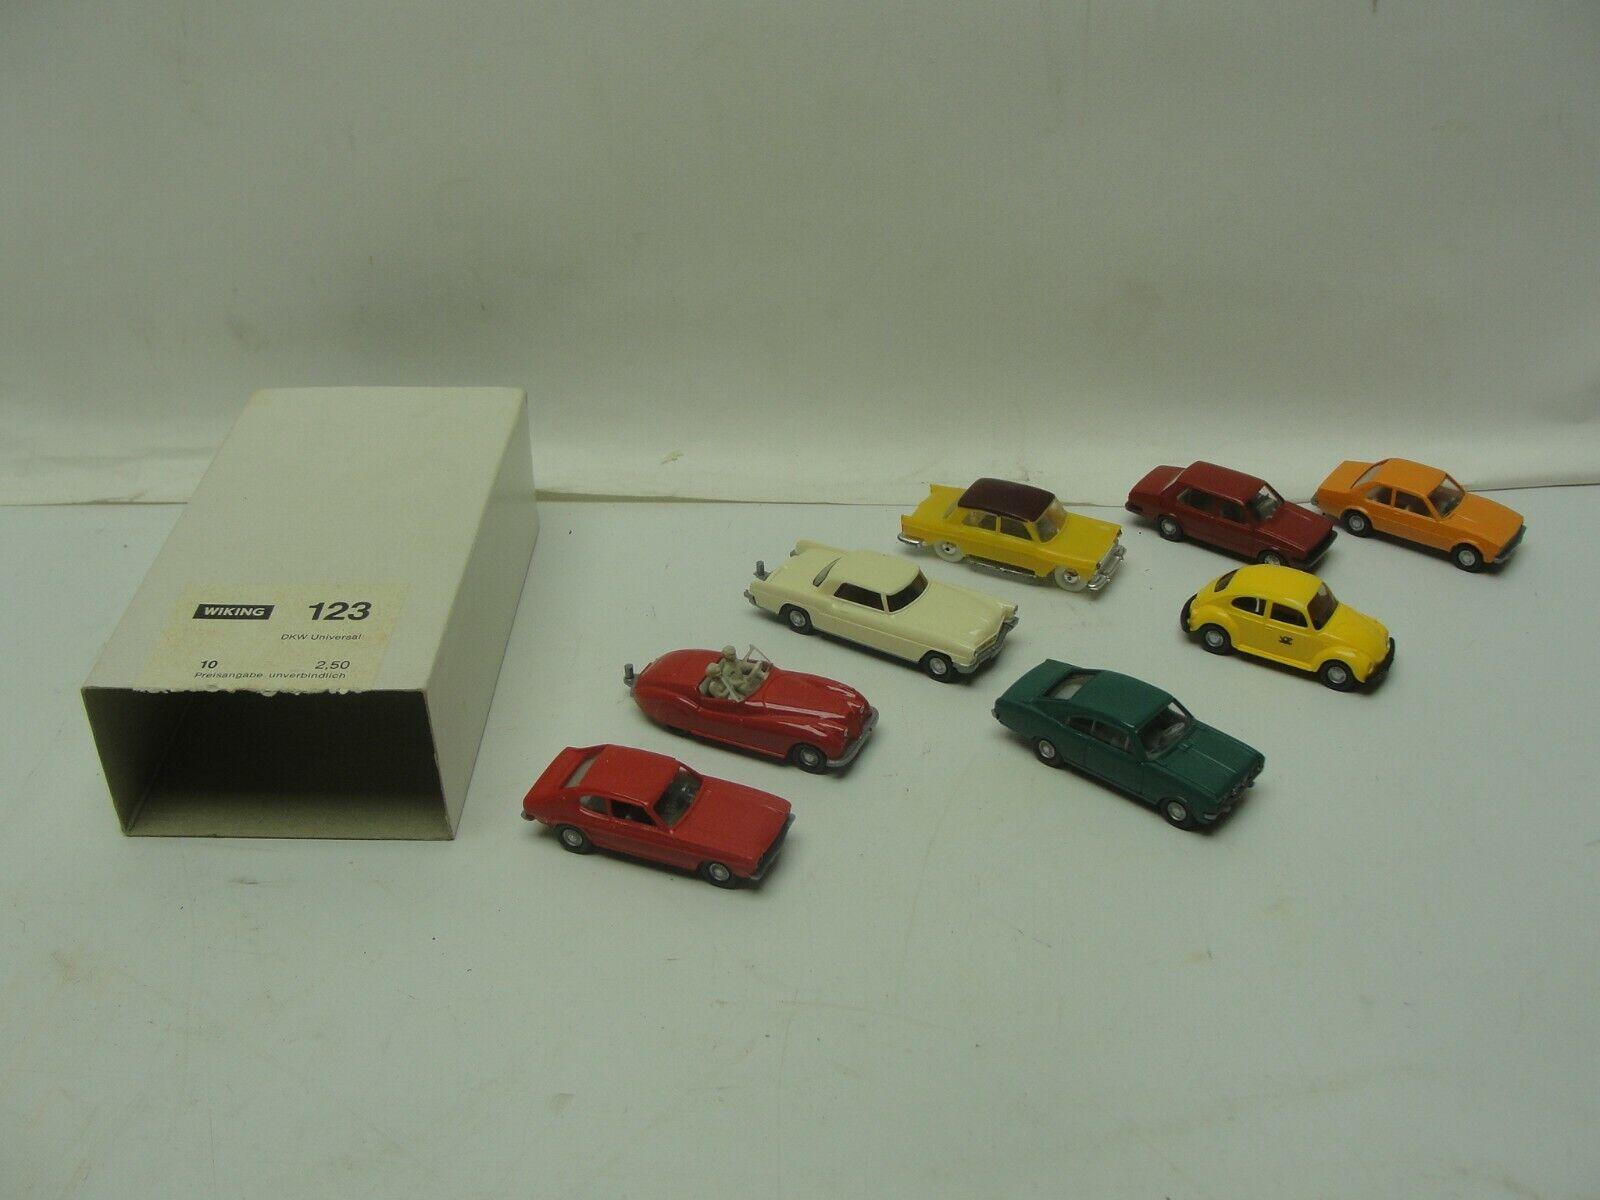 con 60% de descuento (8) Vintage Wiking VW Volkswagen EsCocheabajo Jetta Jaguar Opel Capri Capri Capri Alemania 1 87 coche  más vendido